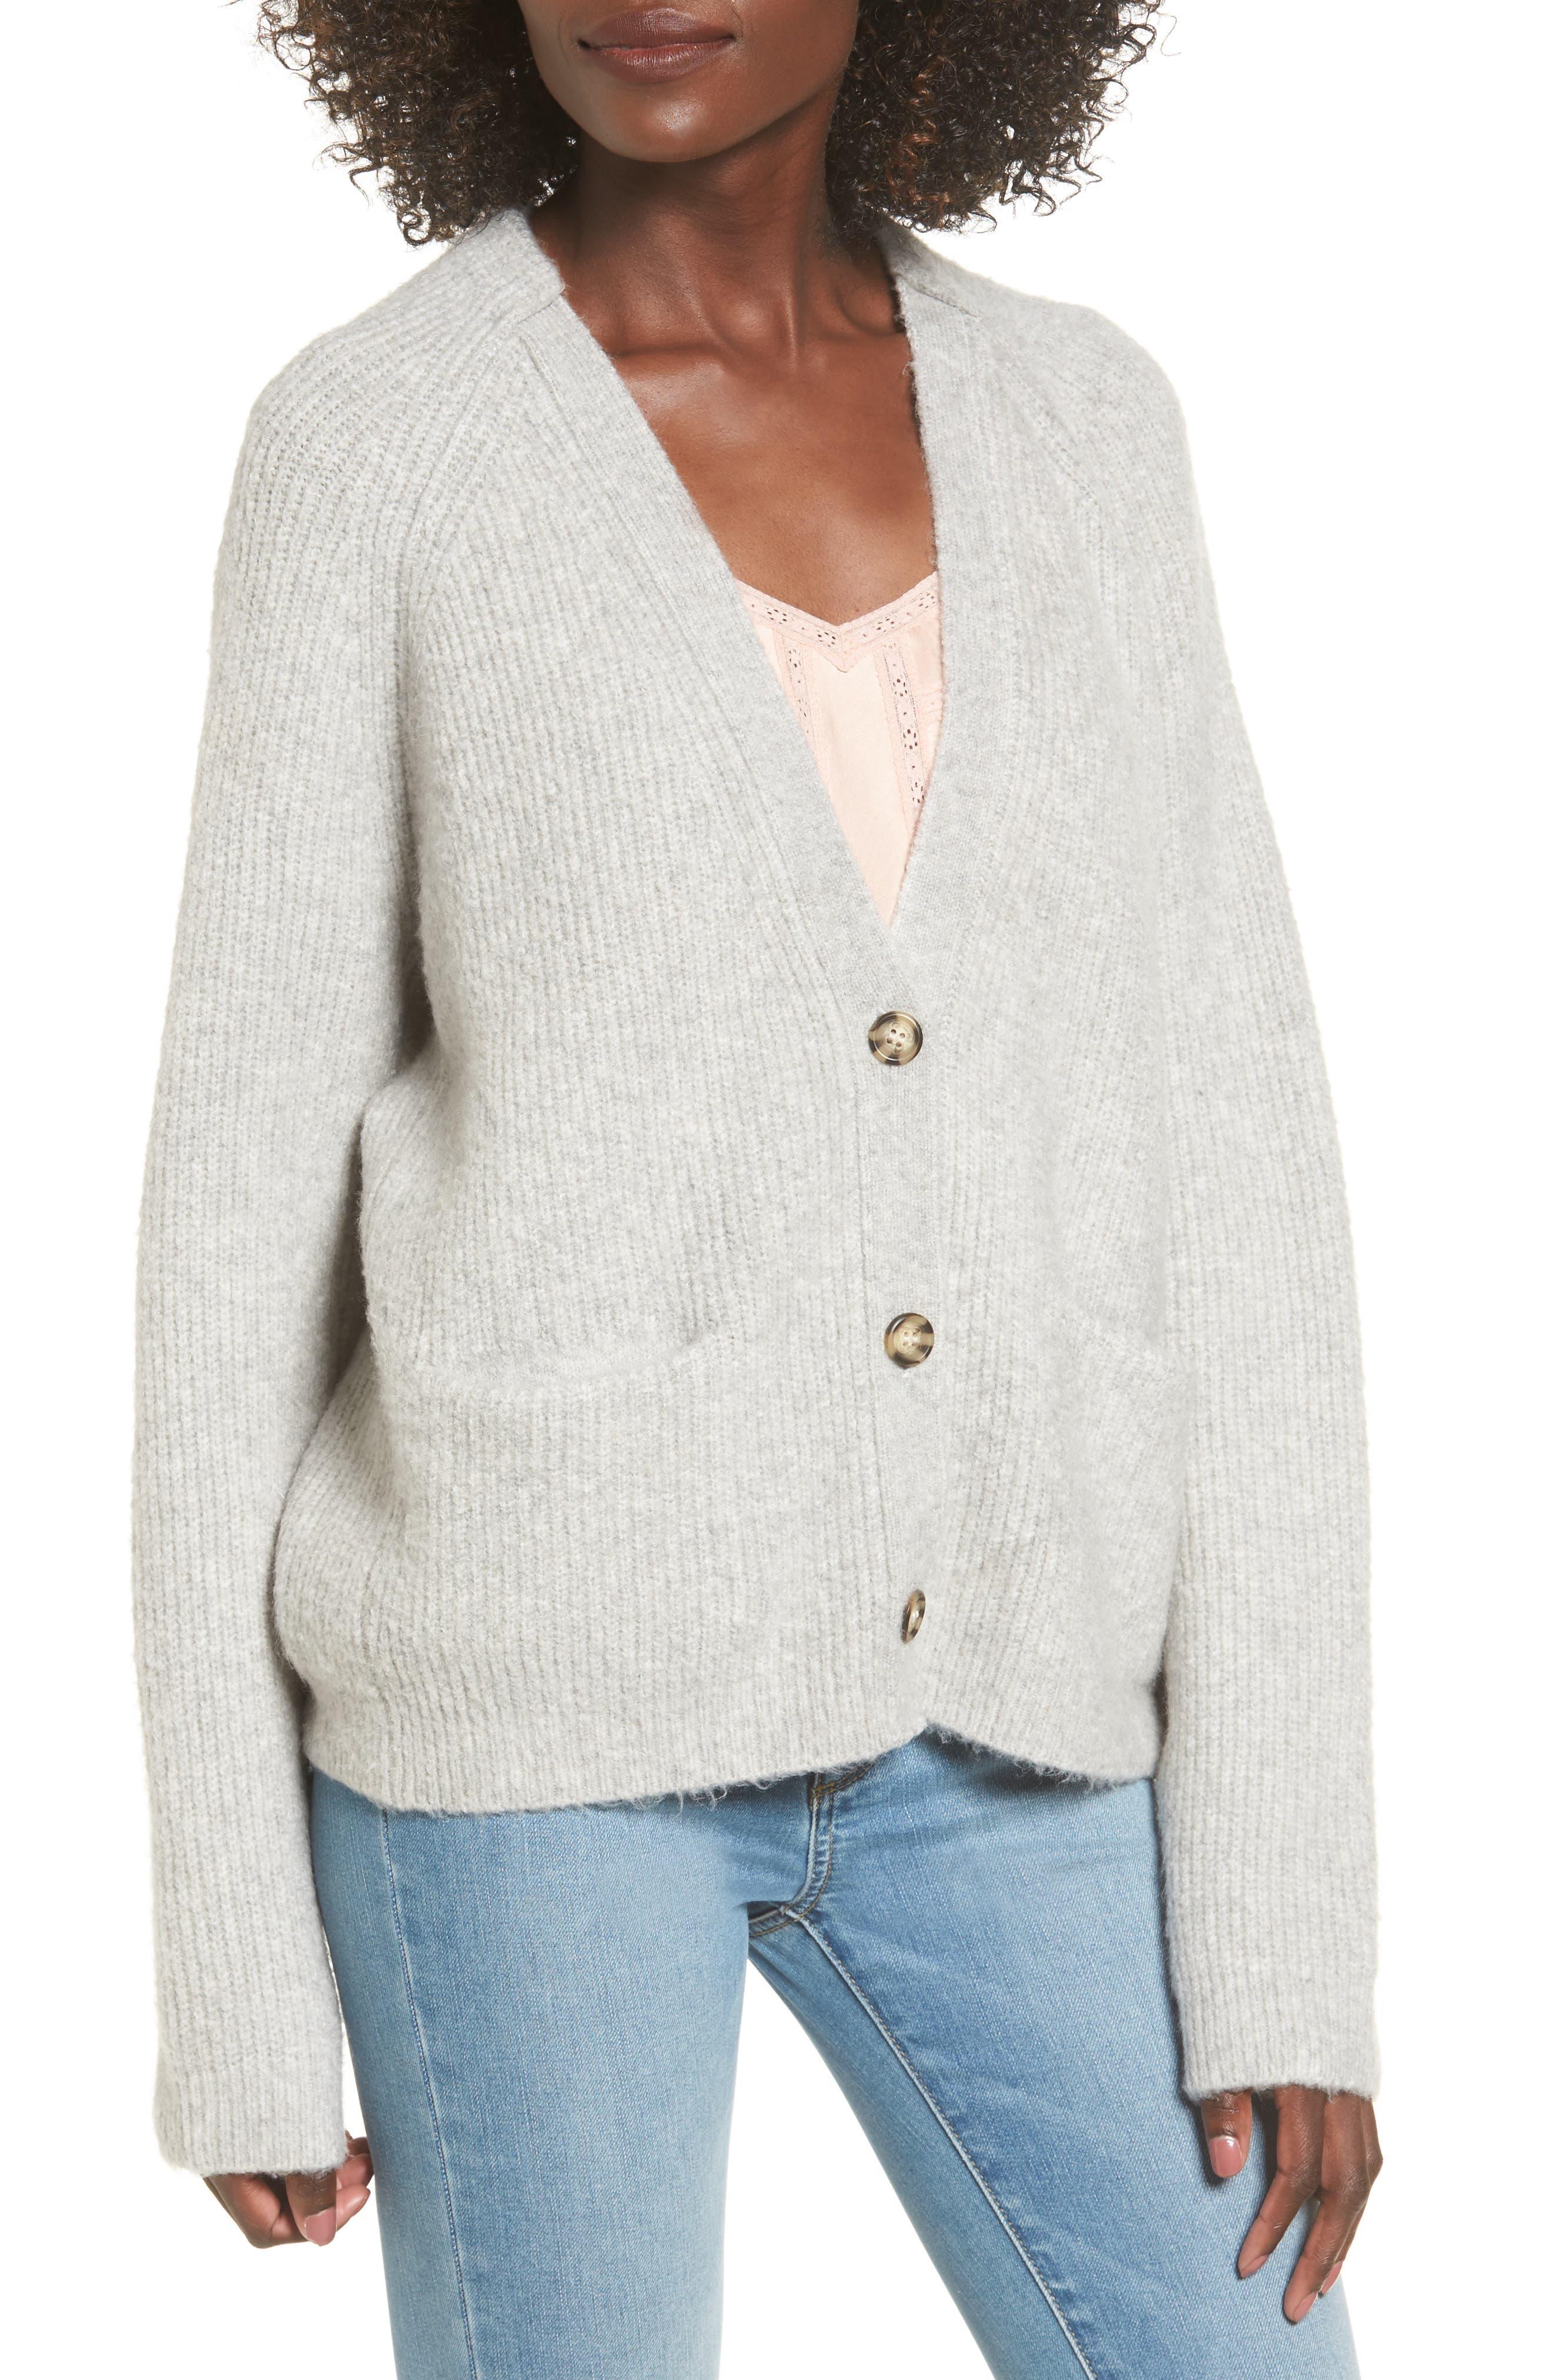 Cardigan Sweater,                             Main thumbnail 1, color,                             Grey Med Htr